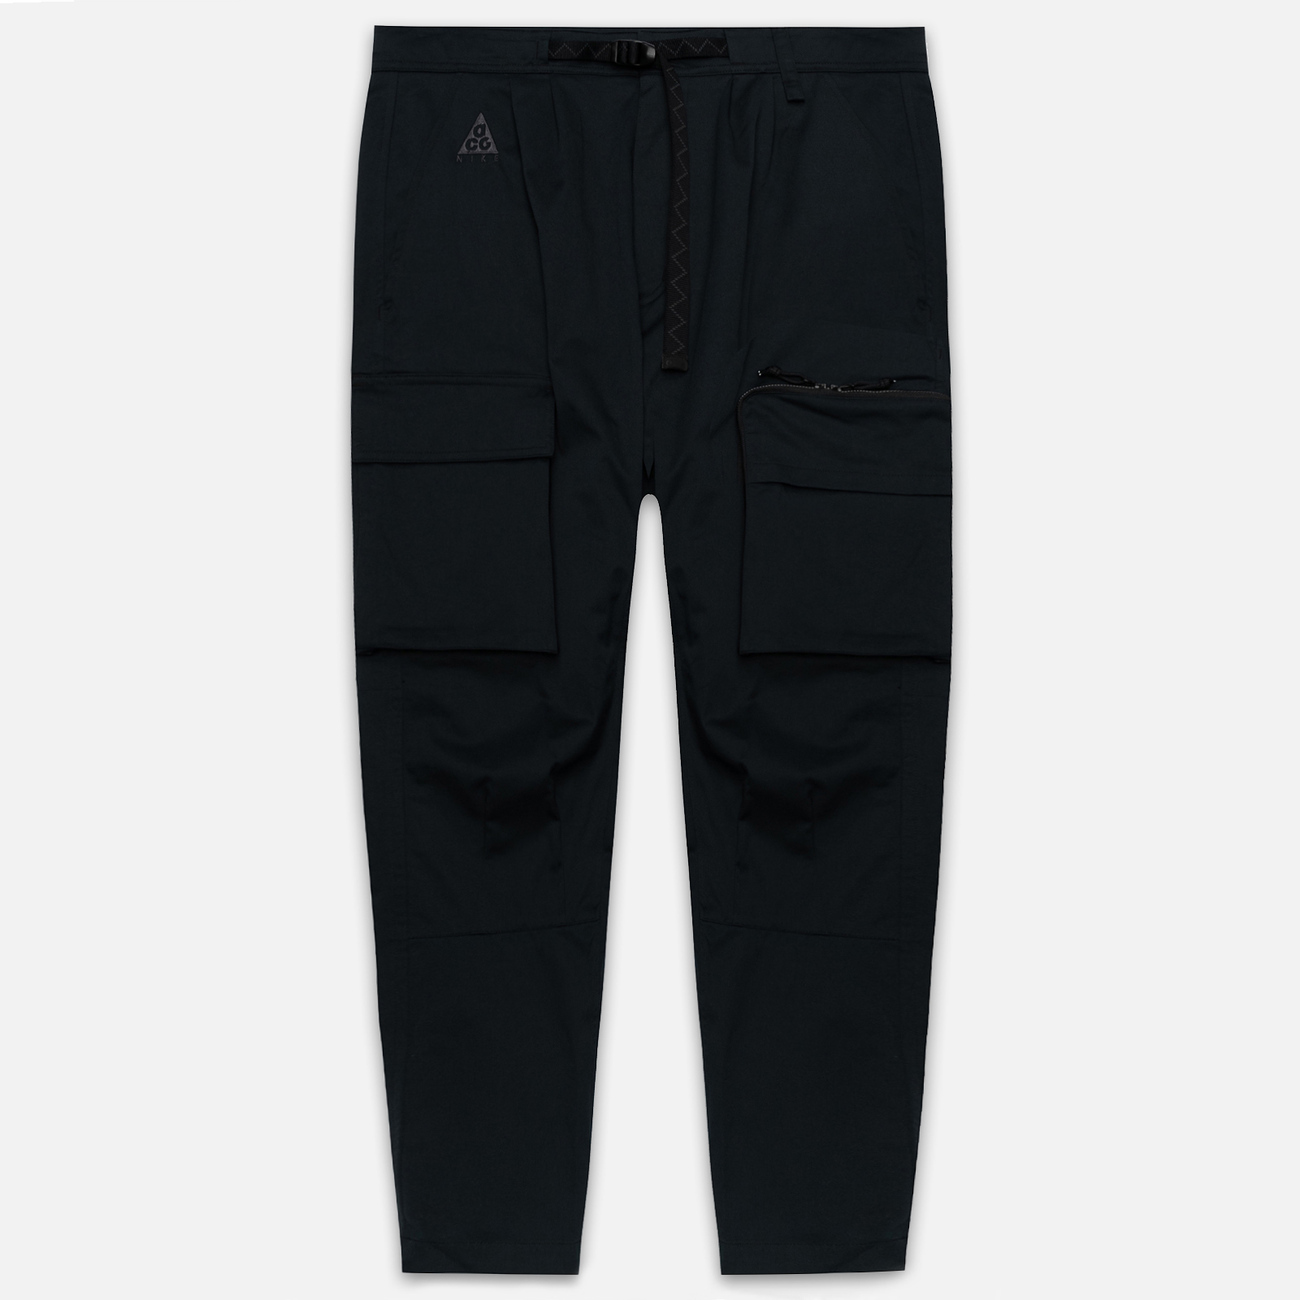 Мужские брюки Nike ACG NRG Cargo Black/Black